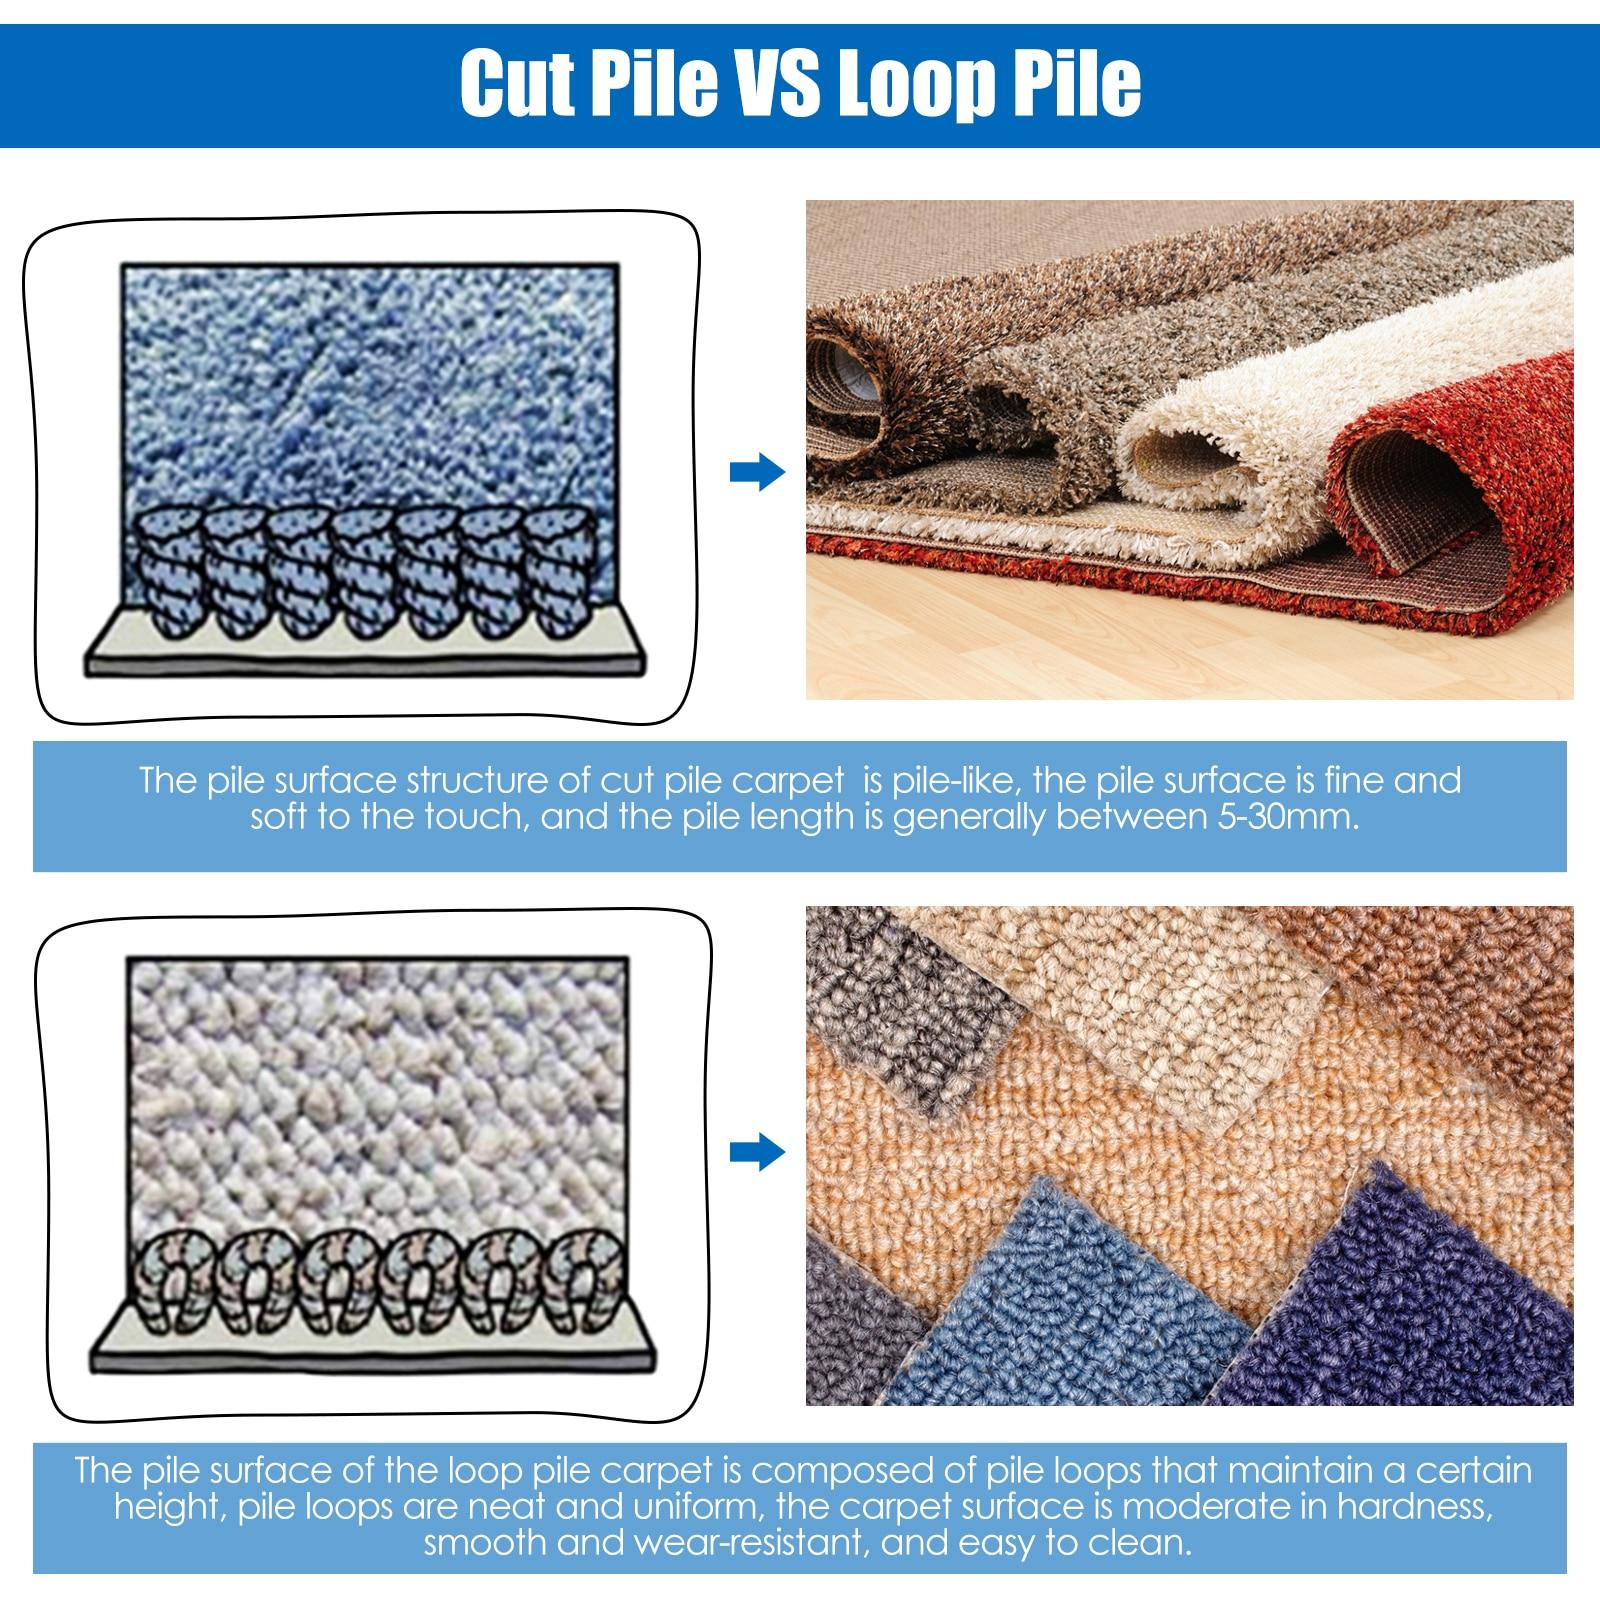 Electric Carpet Tufting Gun Carpet Weaving Machine Industrial Embroidery Machine Cut Pile Loop Pile Knitting Machine enlarge